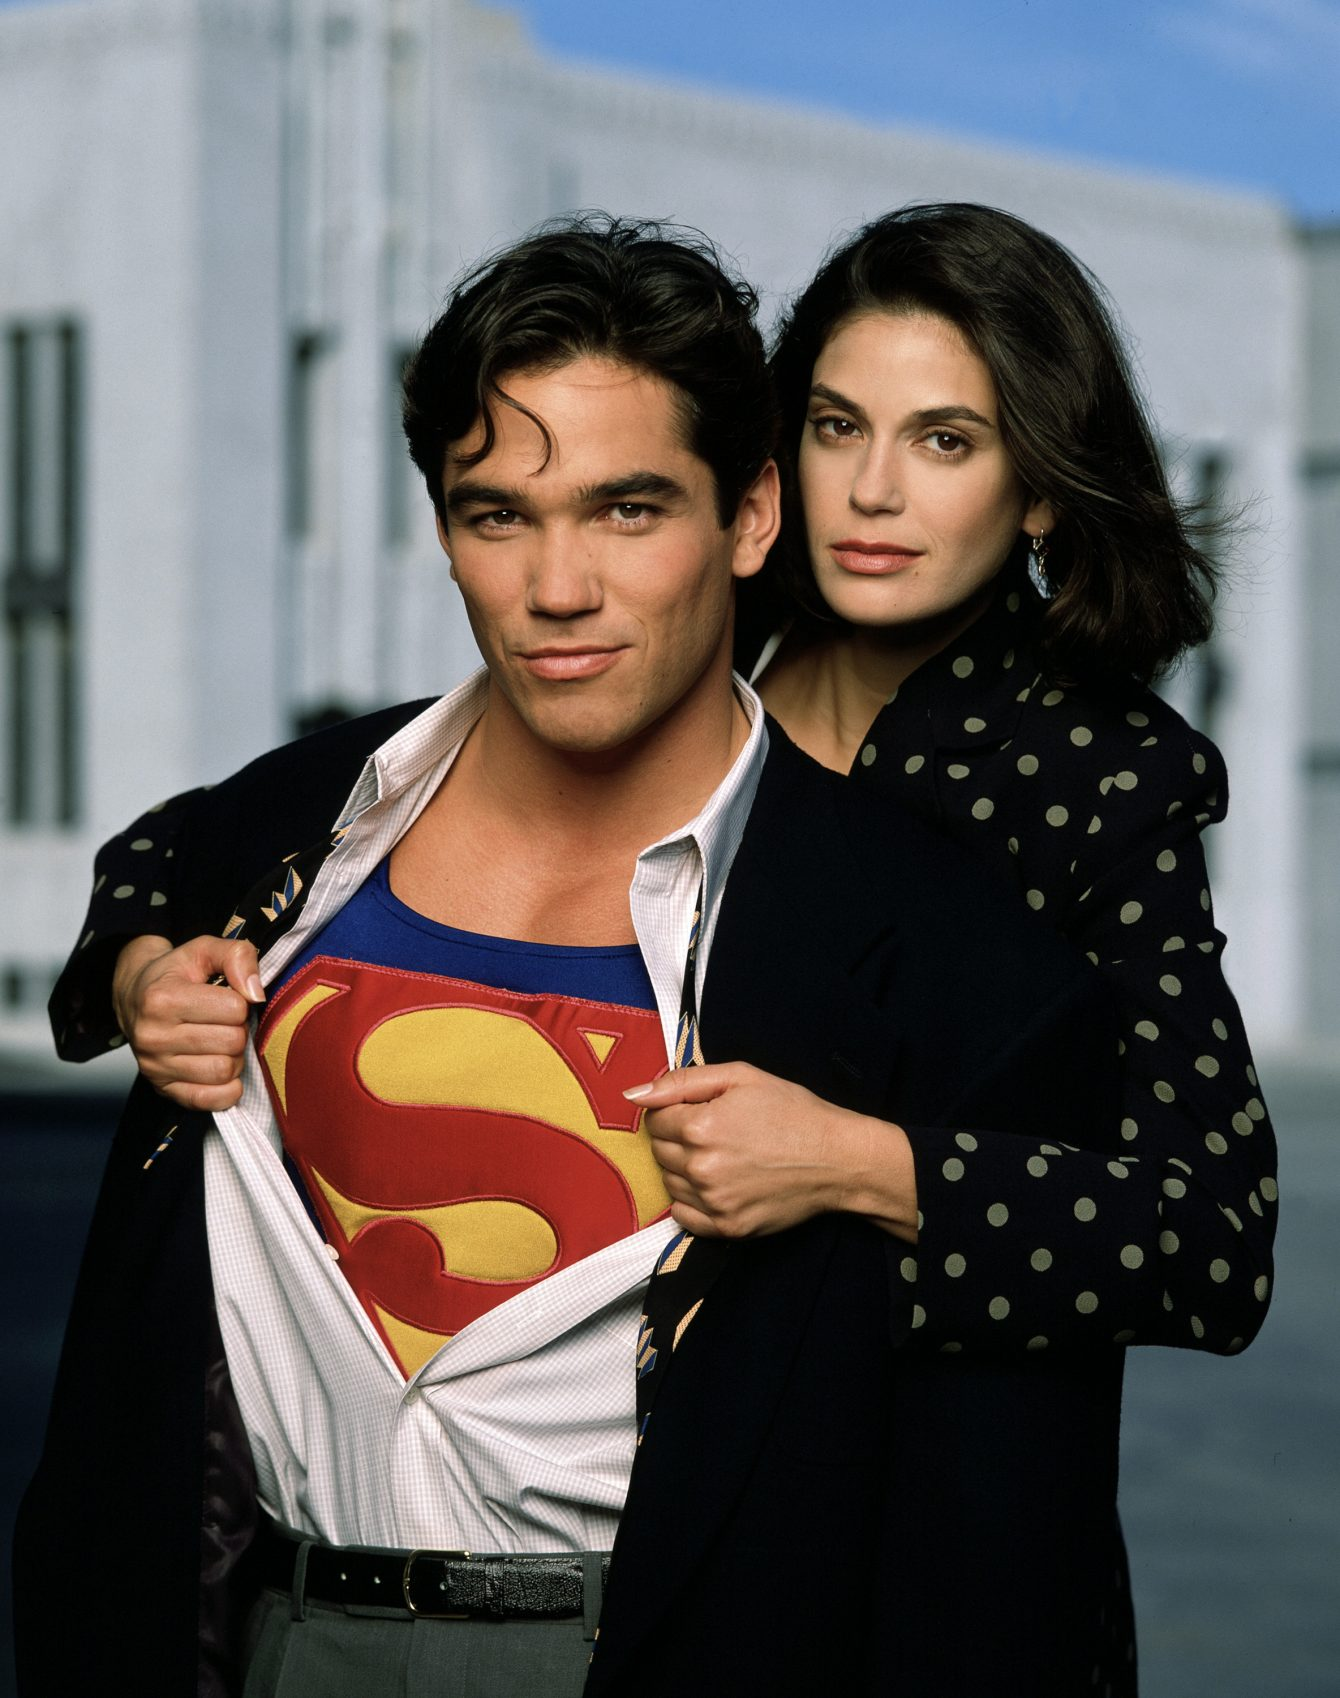 Dean Cain and Teri Hatcher